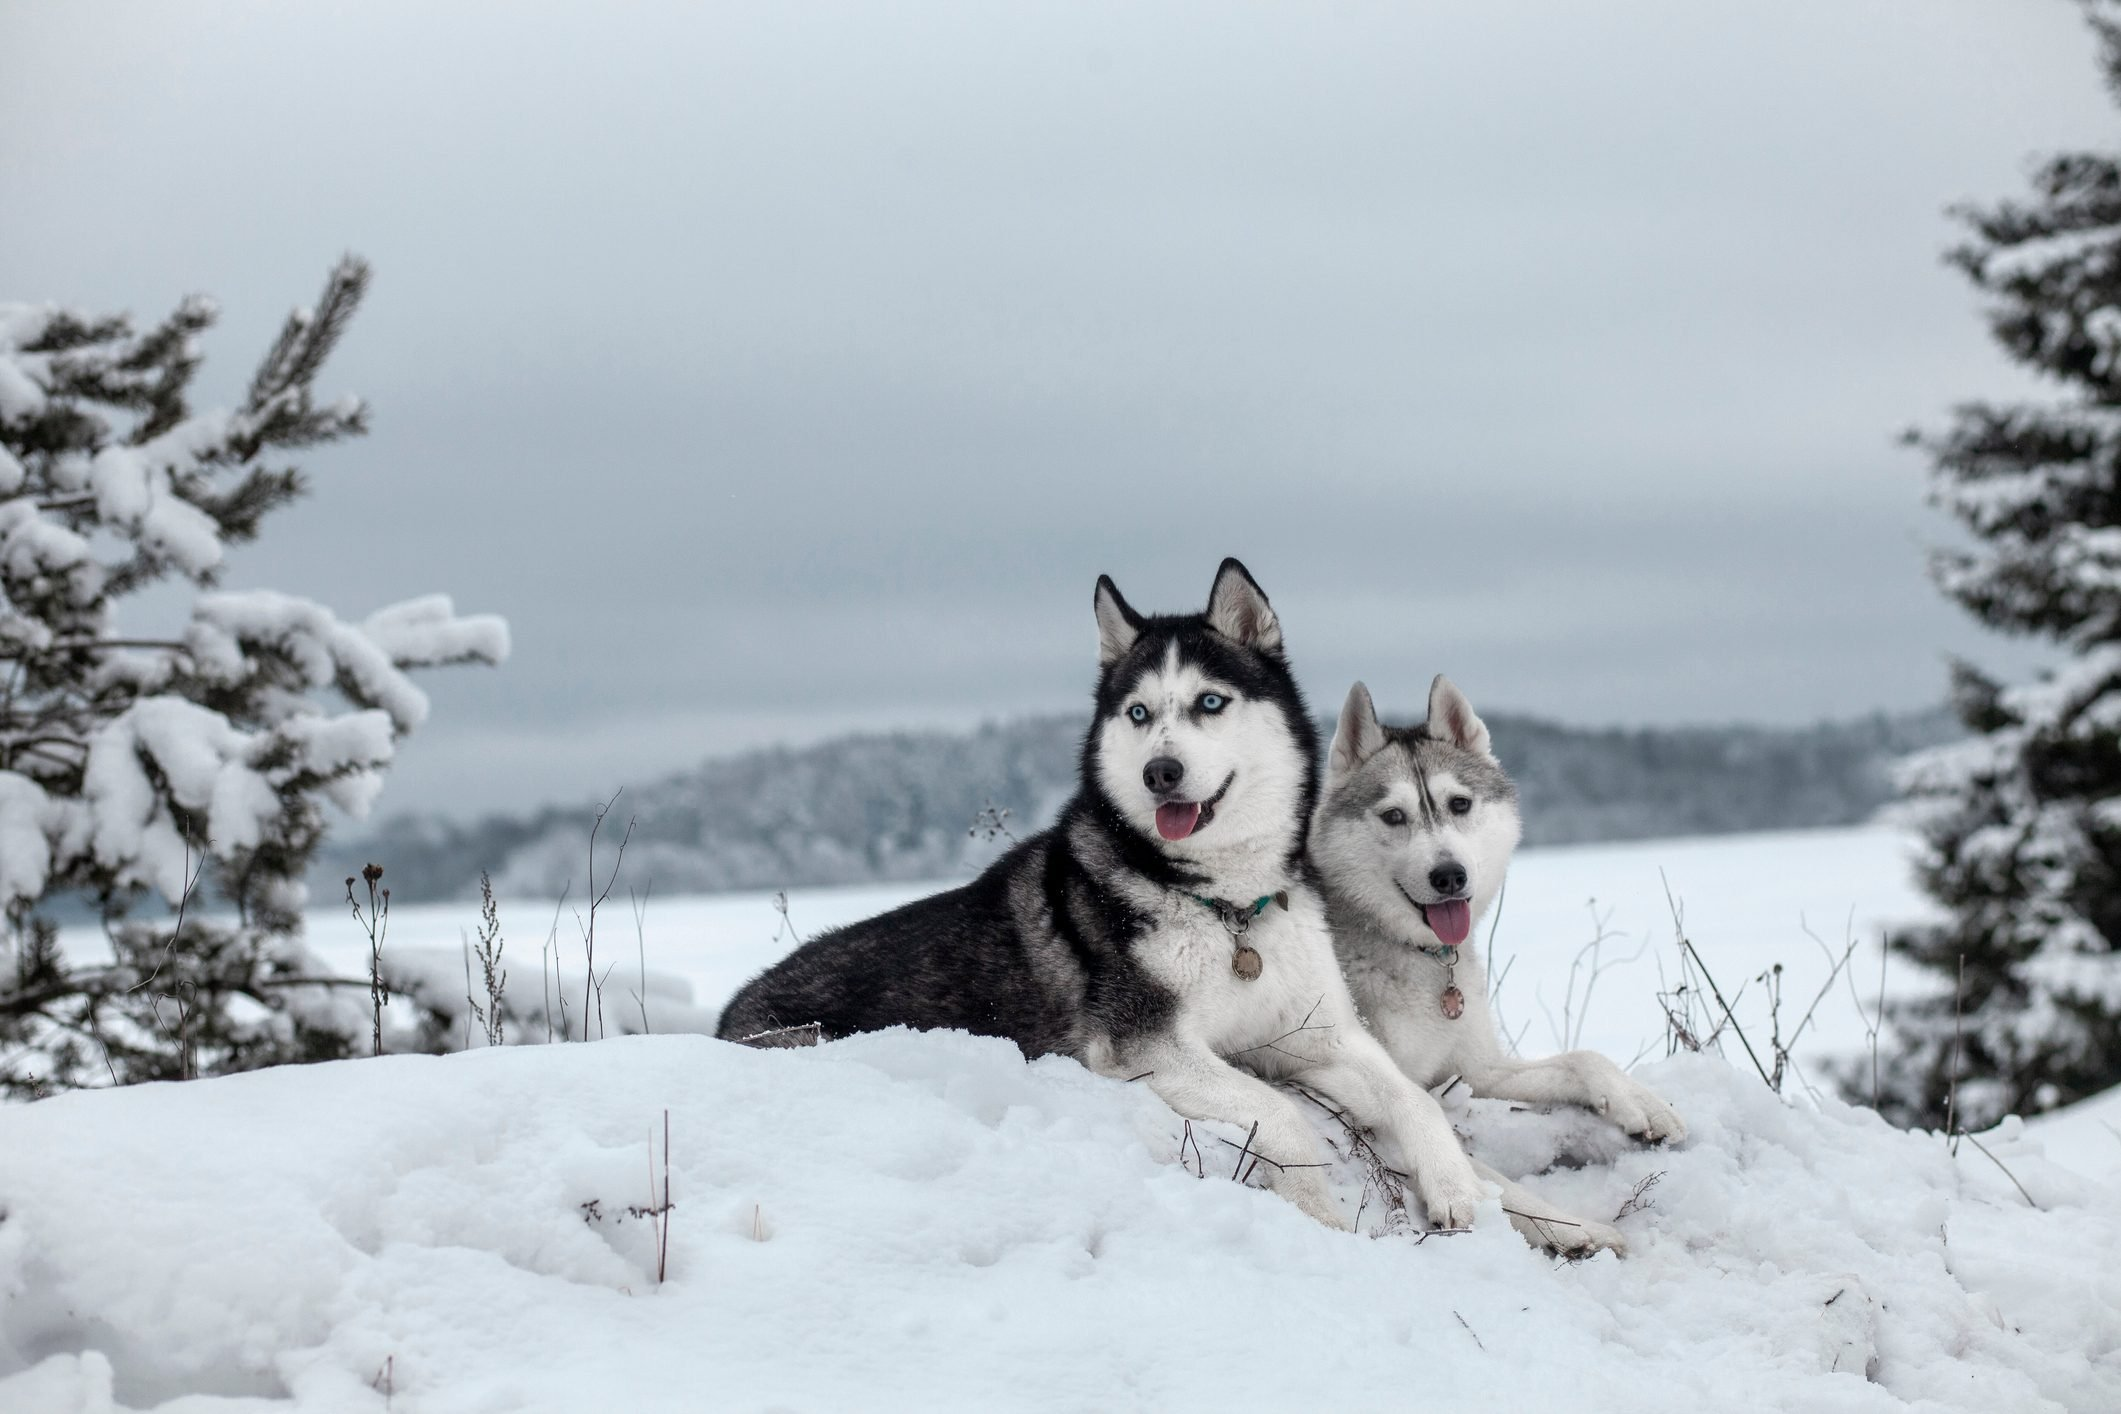 Siberian Husky in winter snow